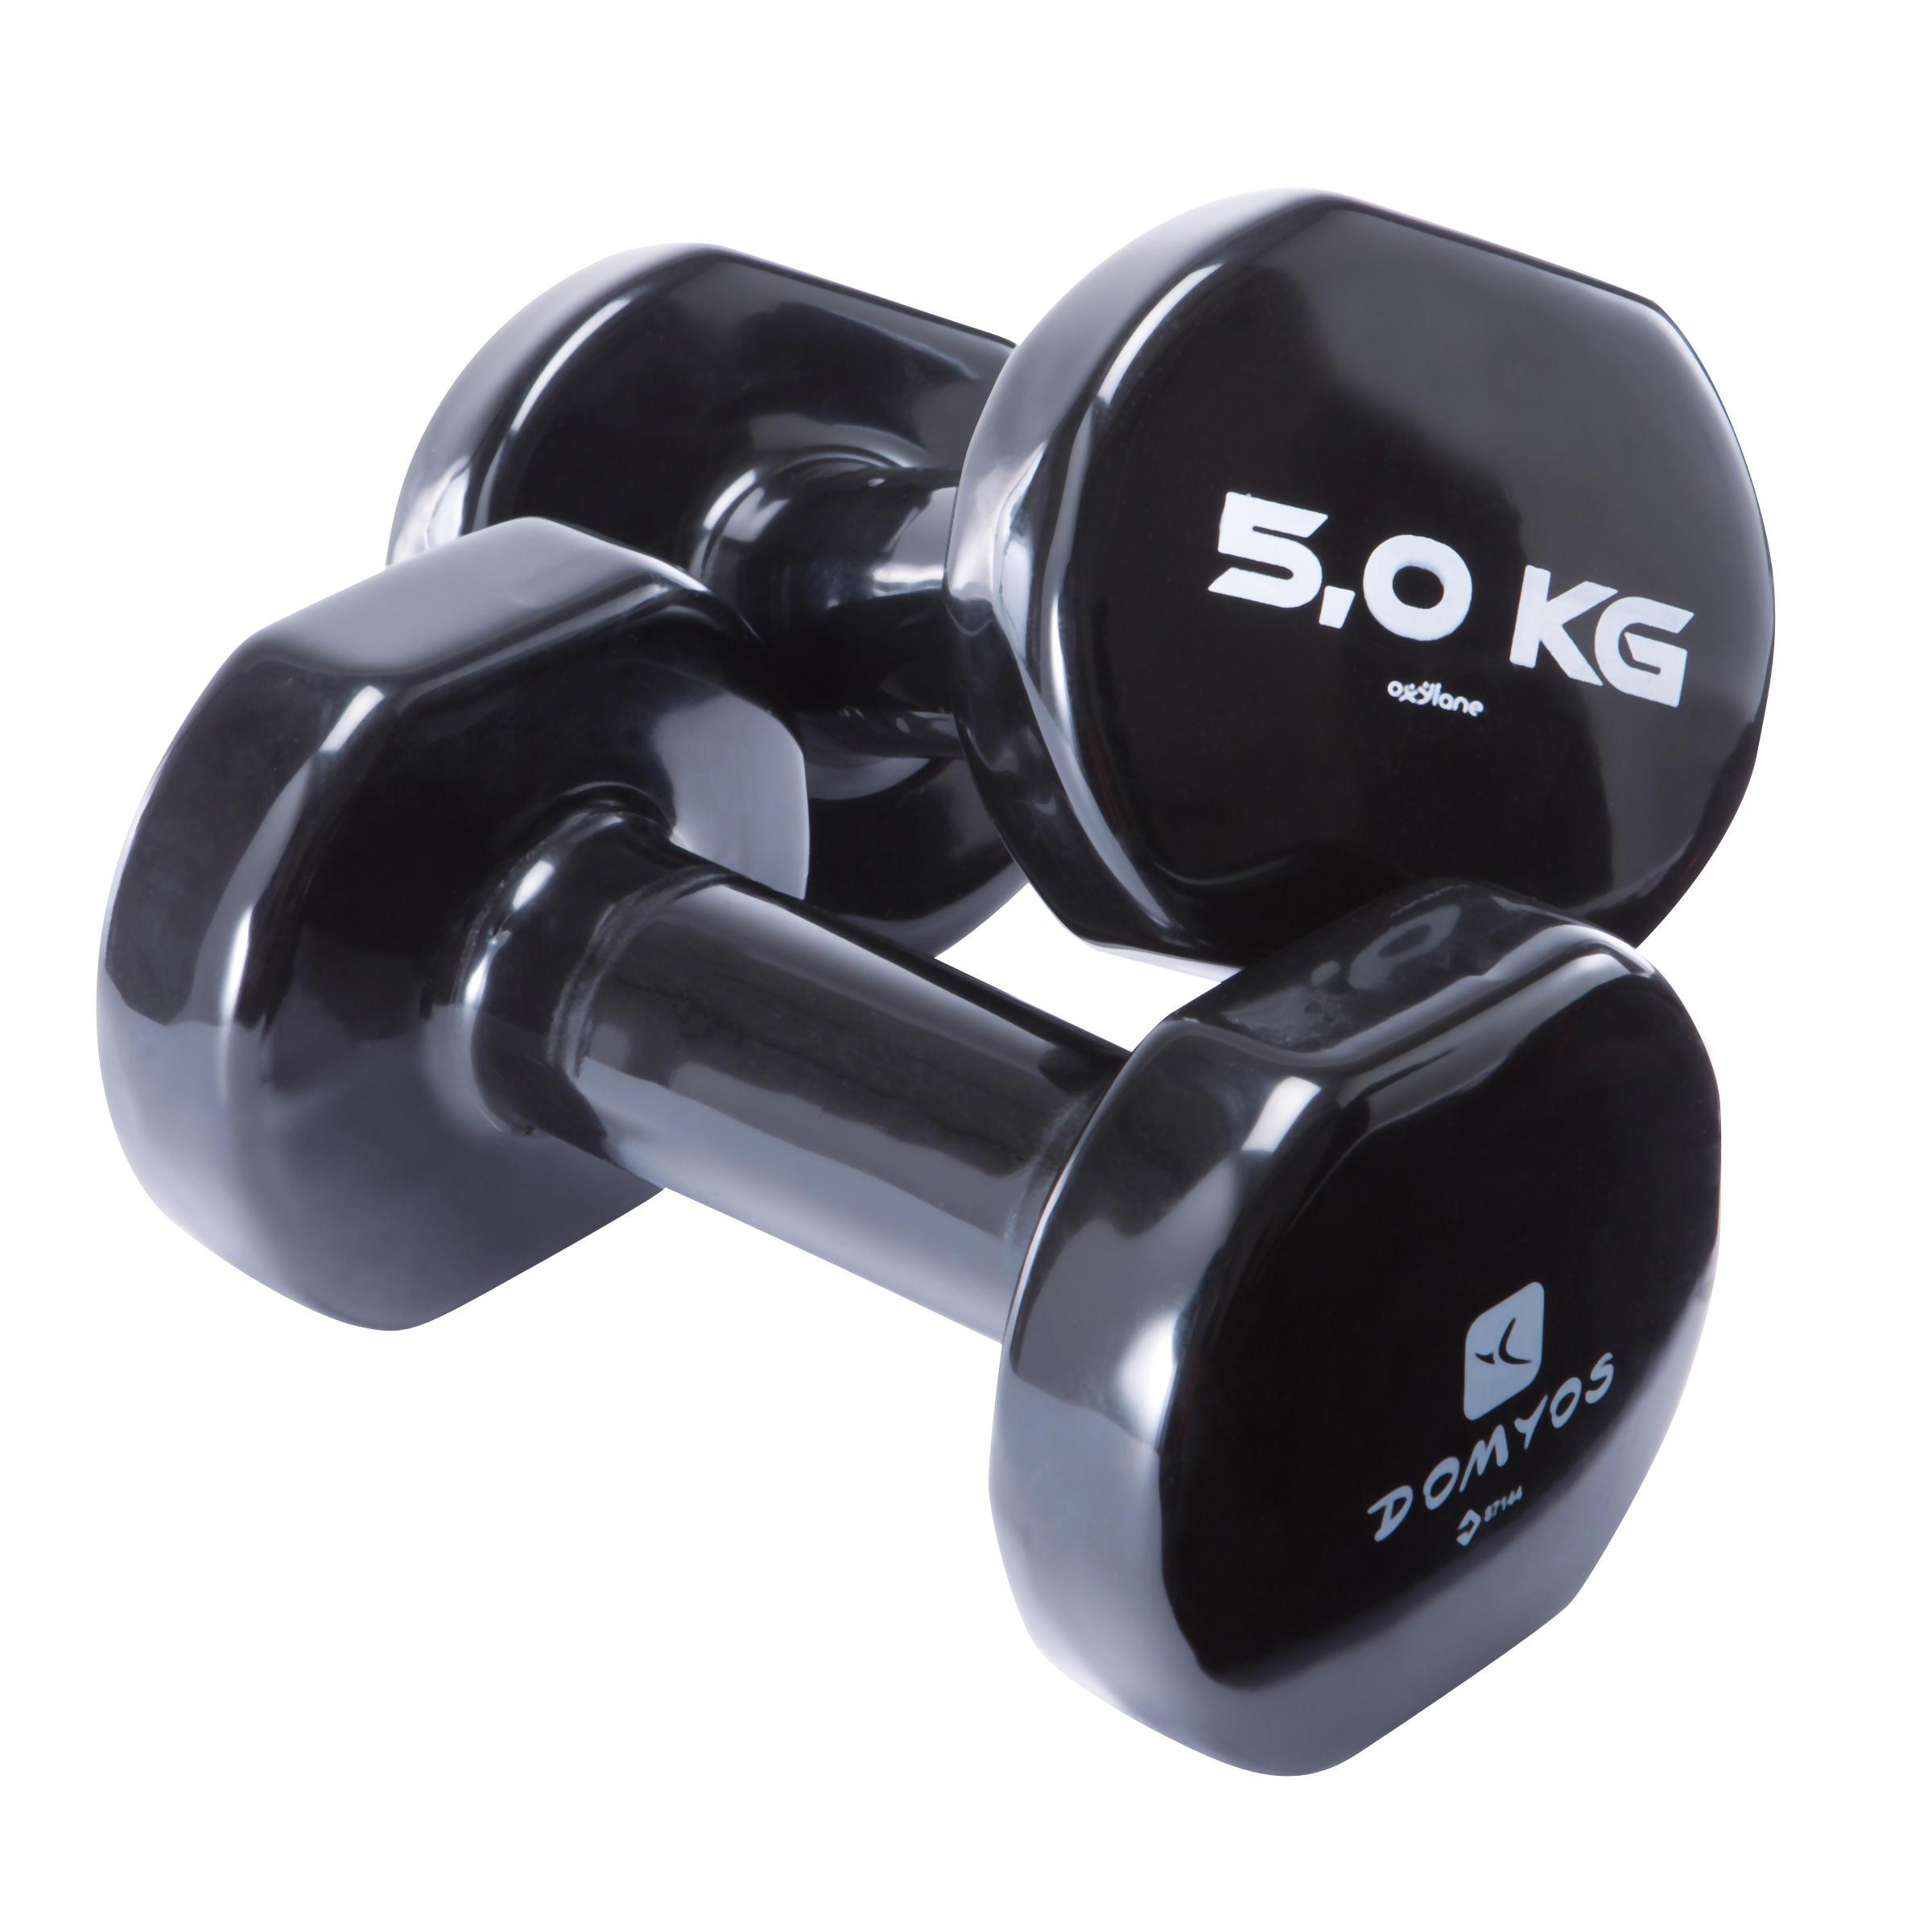 Fitnessmaterial Fitnesskleingerate Sport Erleben Decathlon